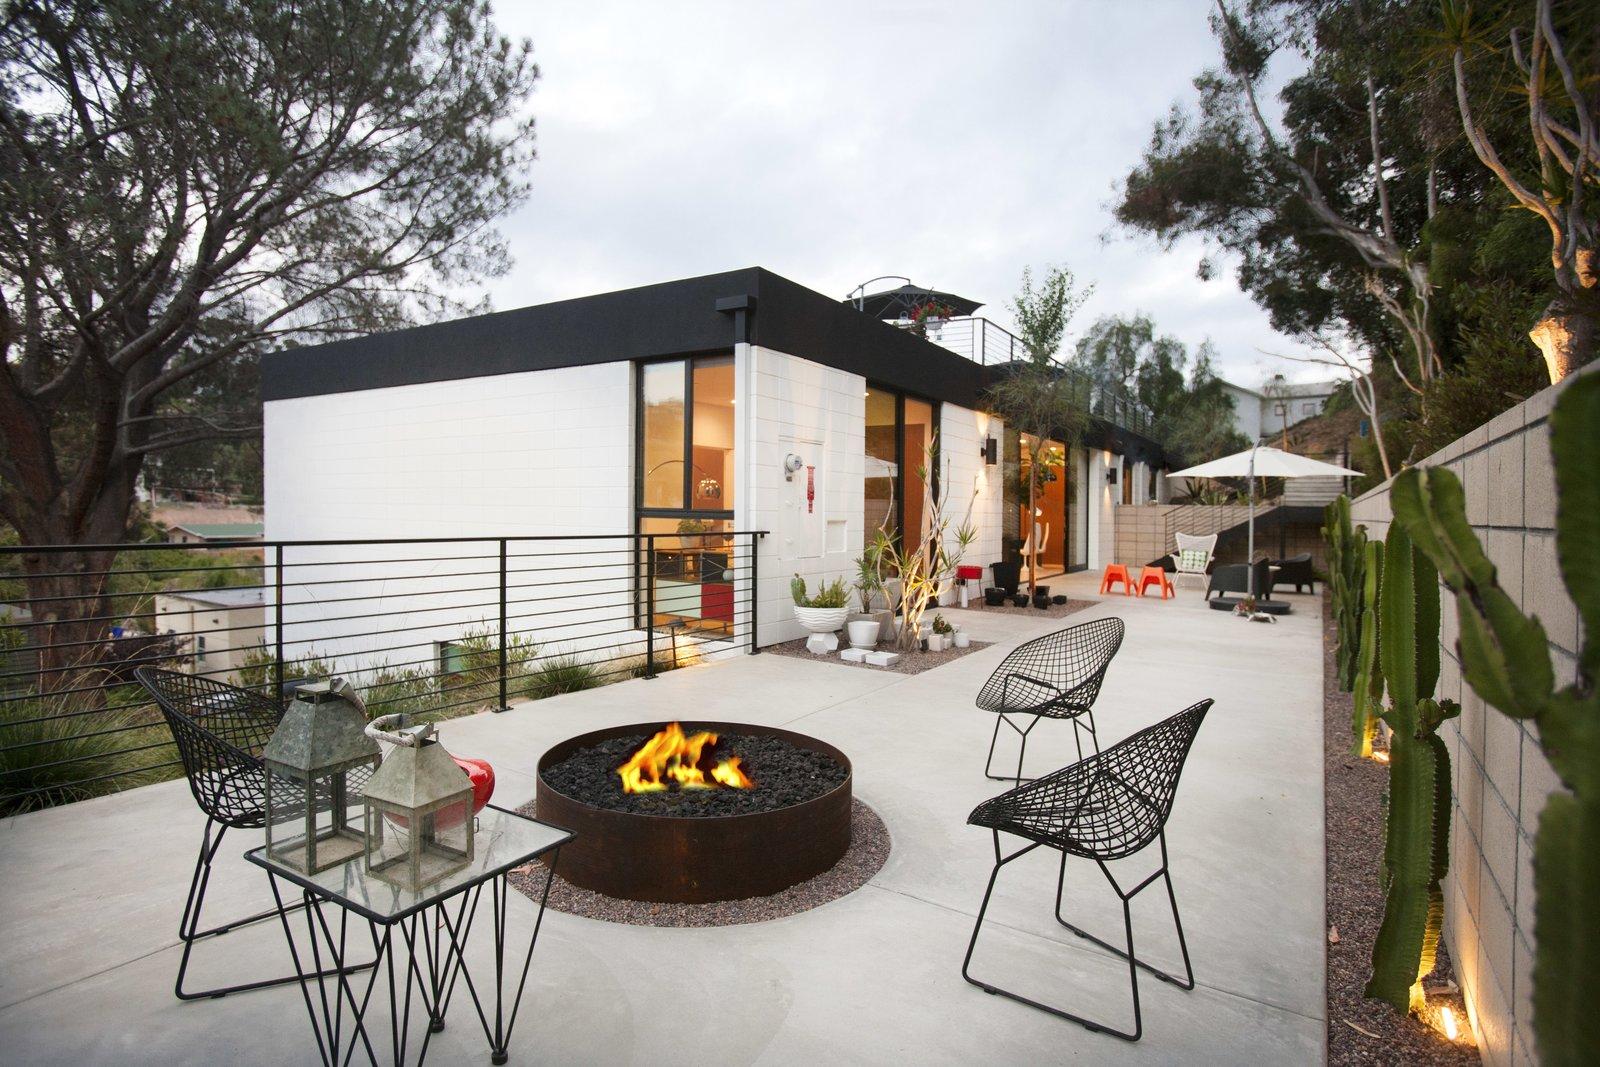 The Clea House by Luke Hopping